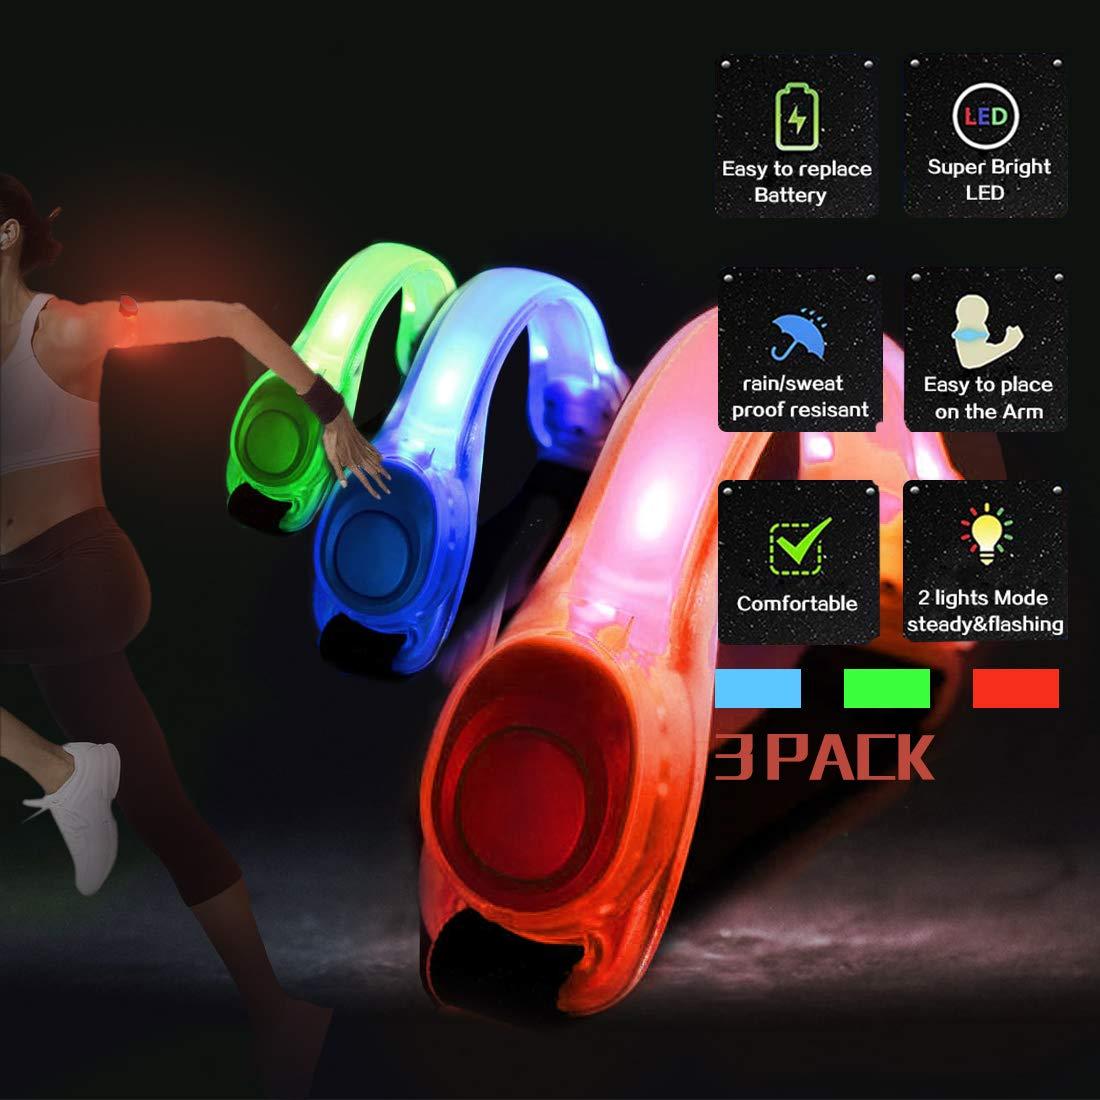 N NEWKOIN LEDアームバンド 高視認性 調節可能な反射ブレスレット 暗闇で光る ランニング ジョギング サイクリング 安全ランニングギア B07N3XV4D2 Red+Green+Blue